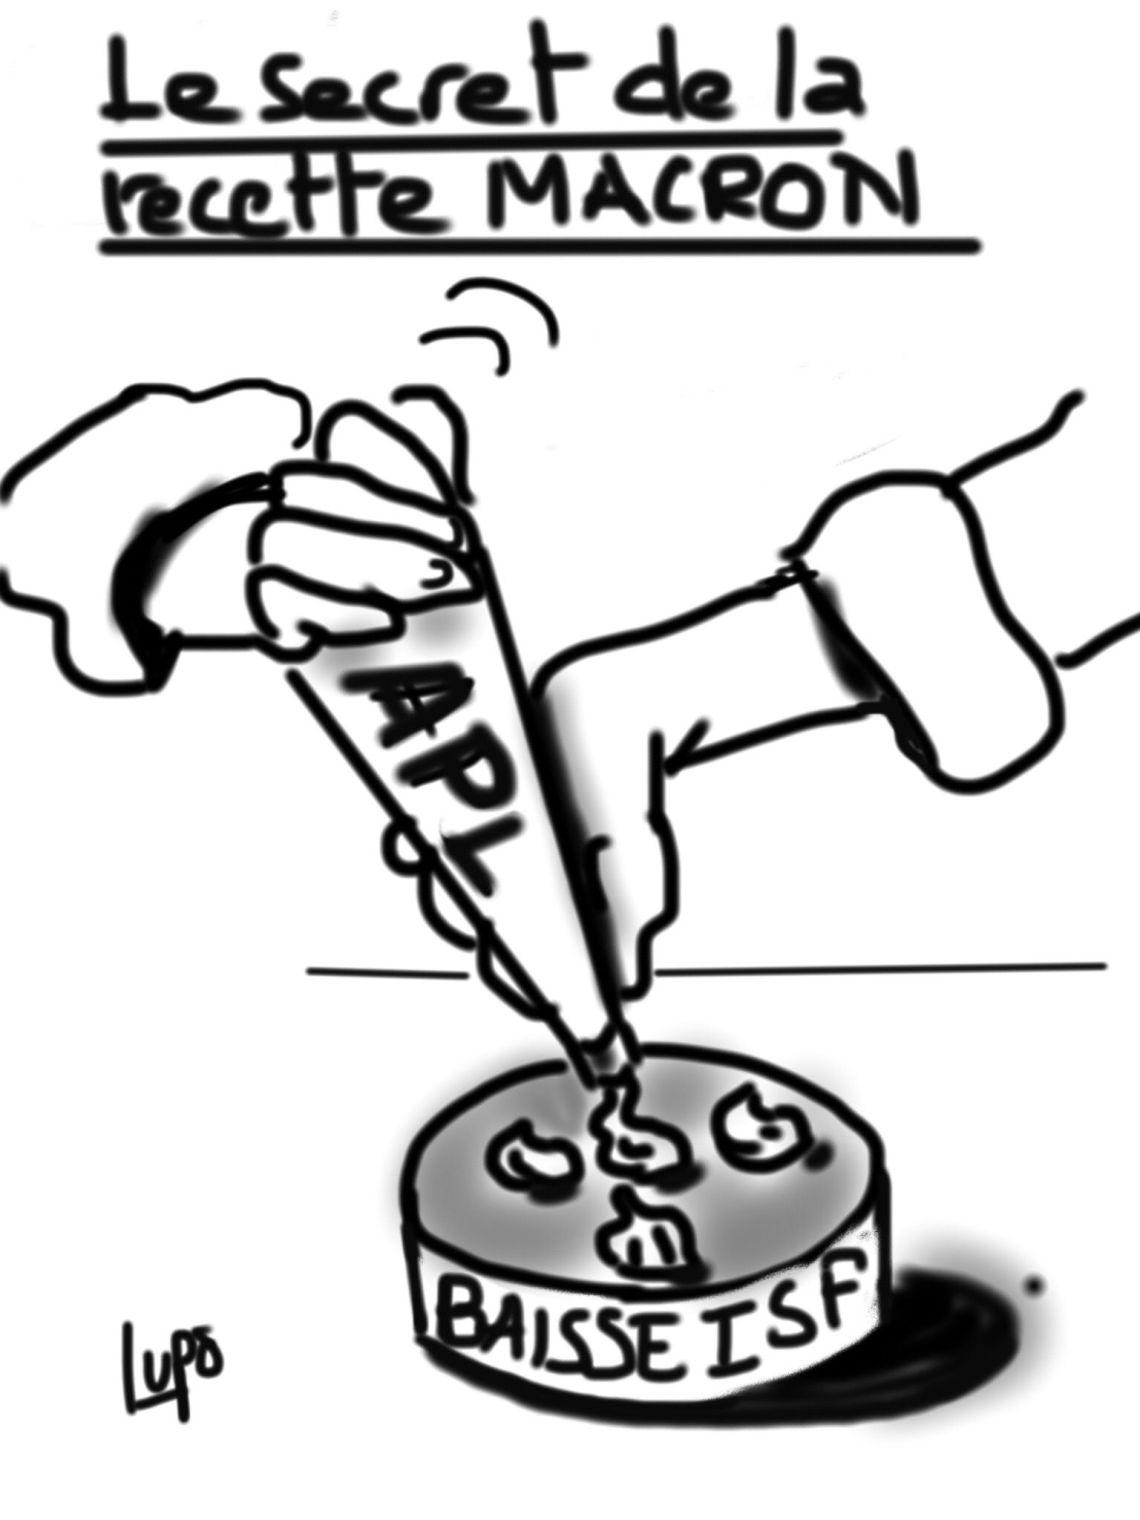 REcette Macron Lupo